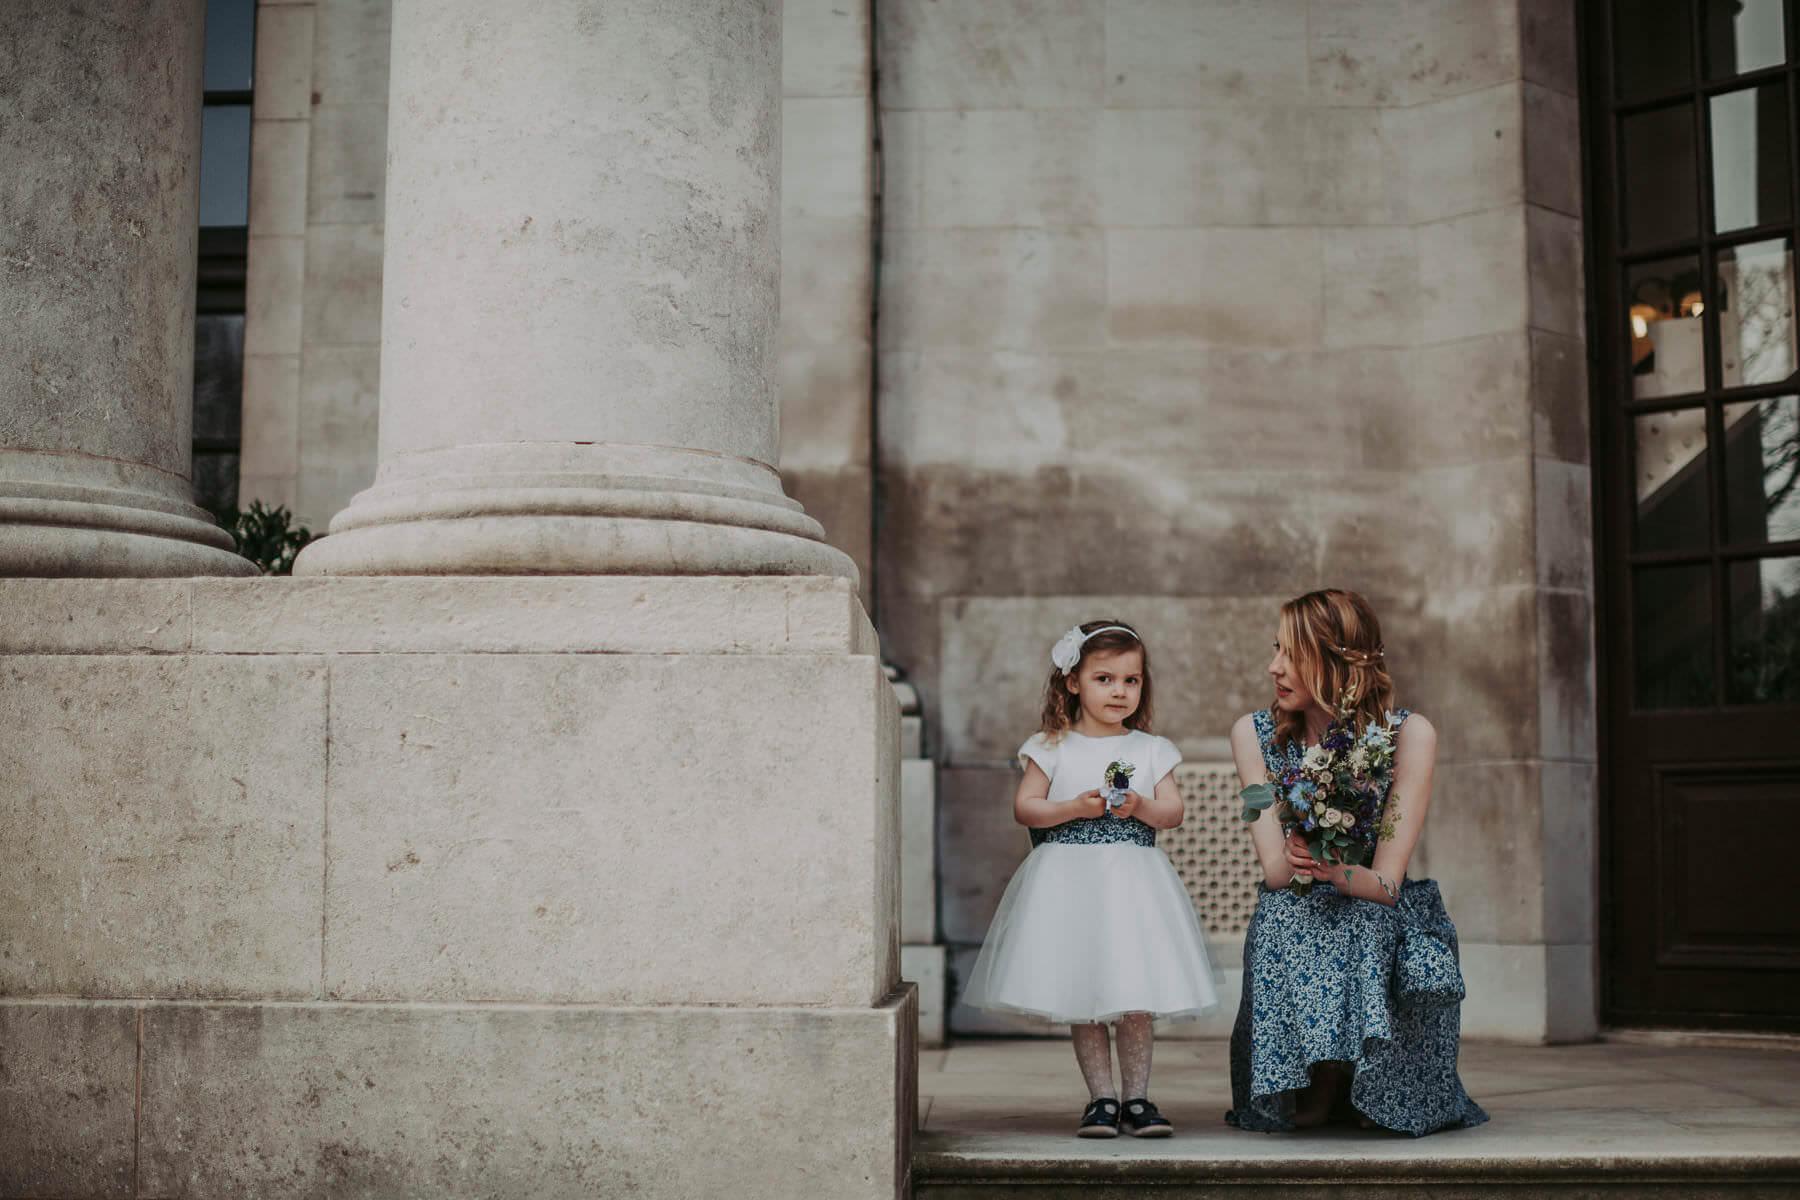 Domino & Pete | Lancaster Memorial wedding 44